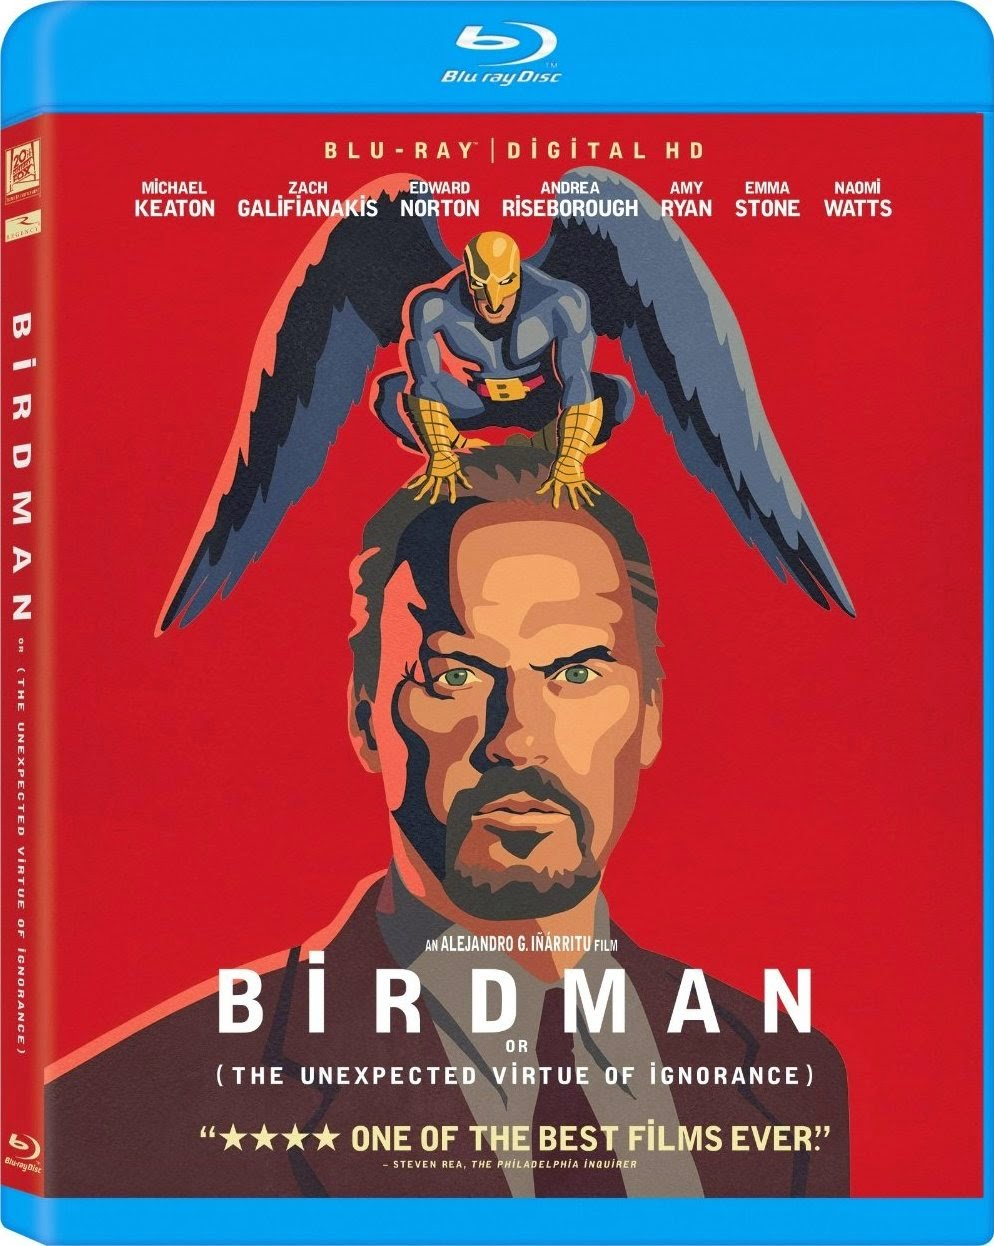 Birdman (2014) 1080p BD25 ESPAÑOL LATINO